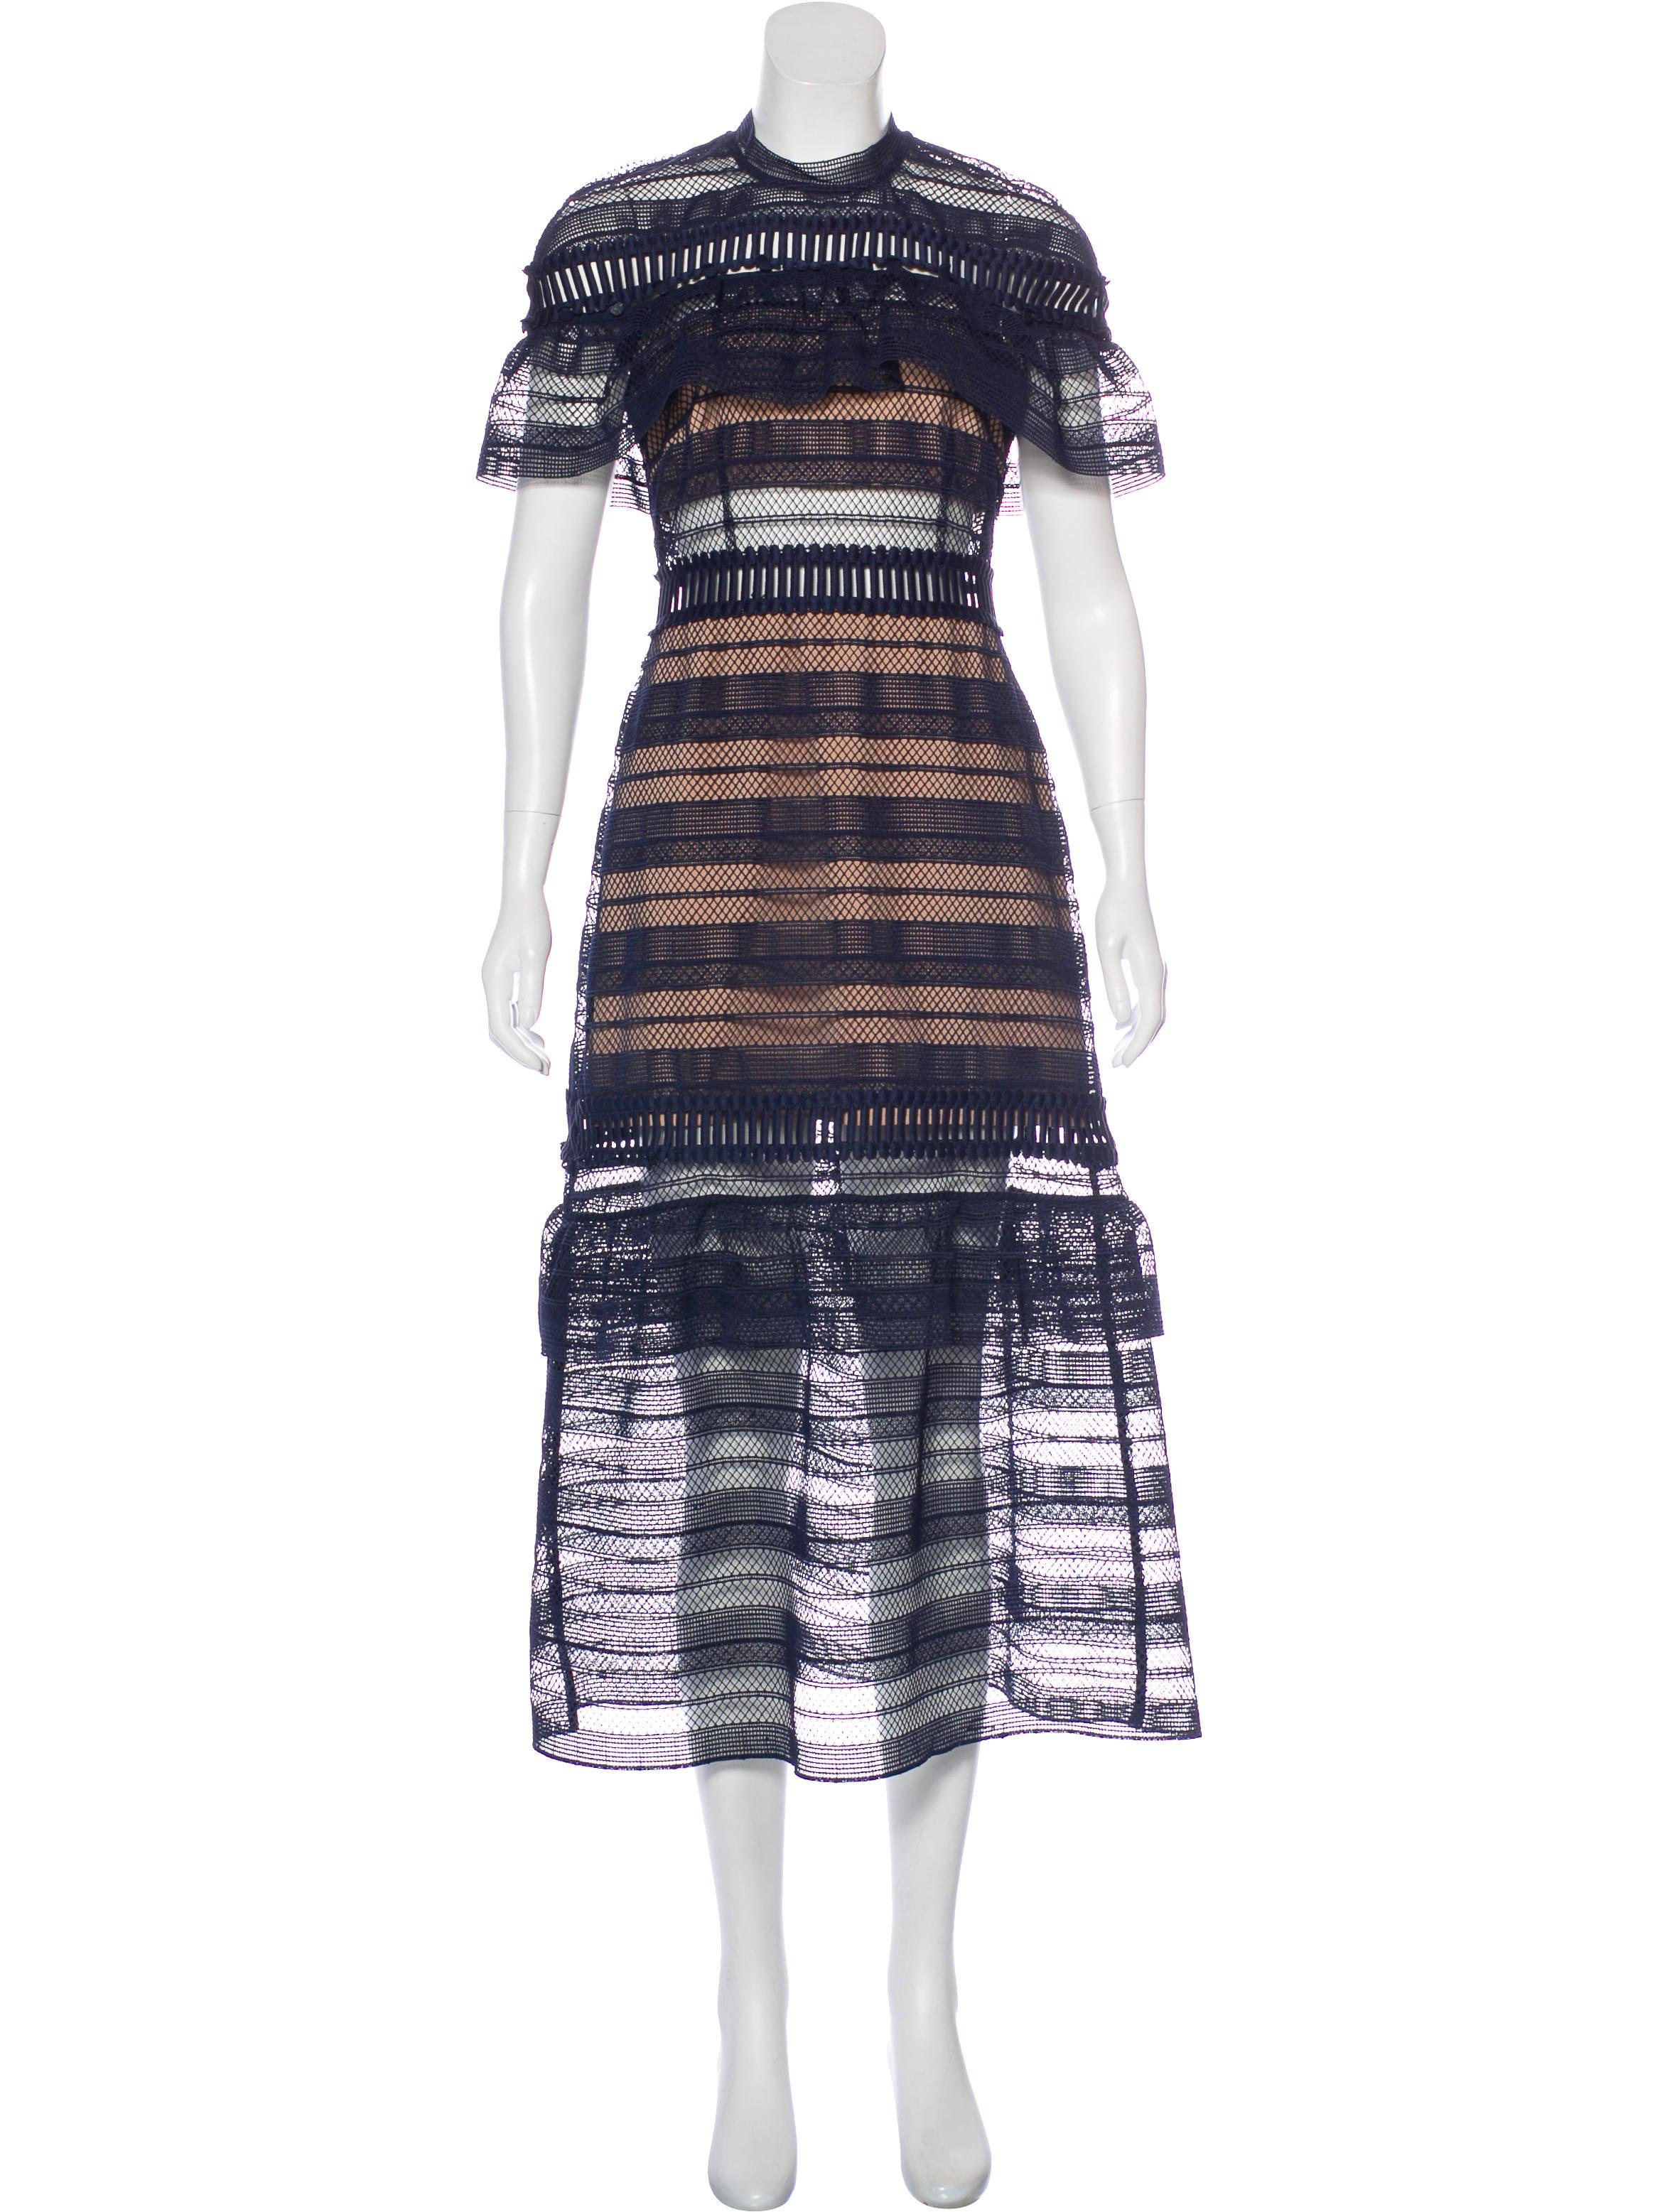 987caa29c9a6 Self-Portrait Nightshade Midi Dress - Clothing - WSELF22717 | The ...